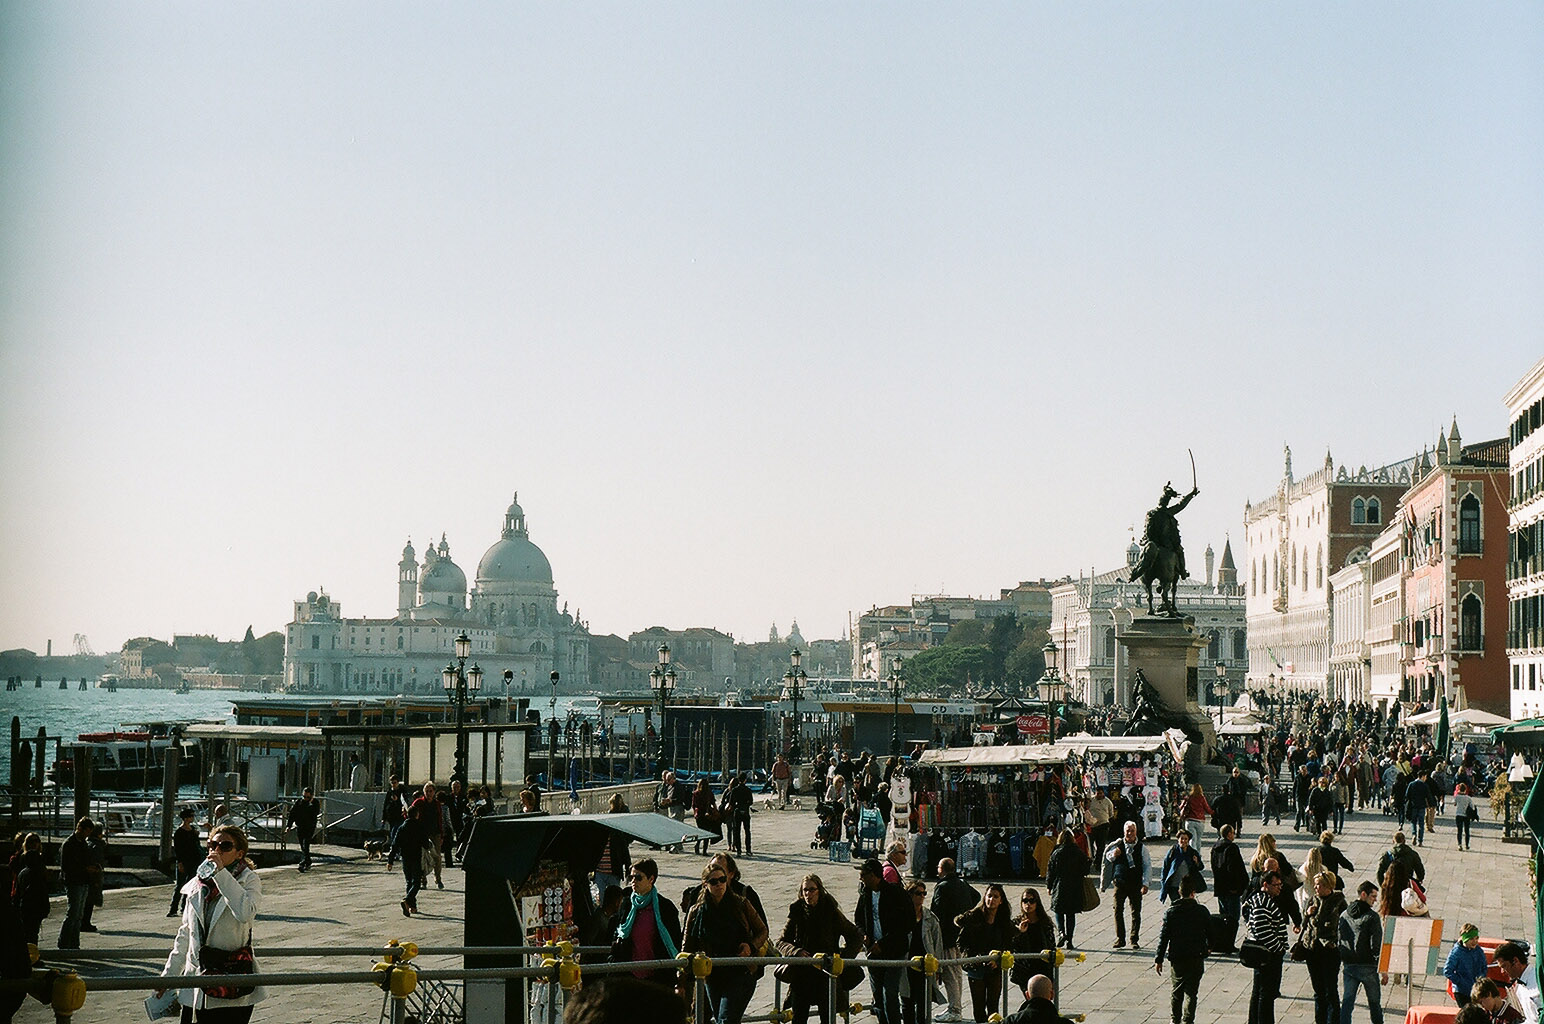 Культурные столицы Италии Культурные столицы Италии 15597077327 1e72fe6203 o